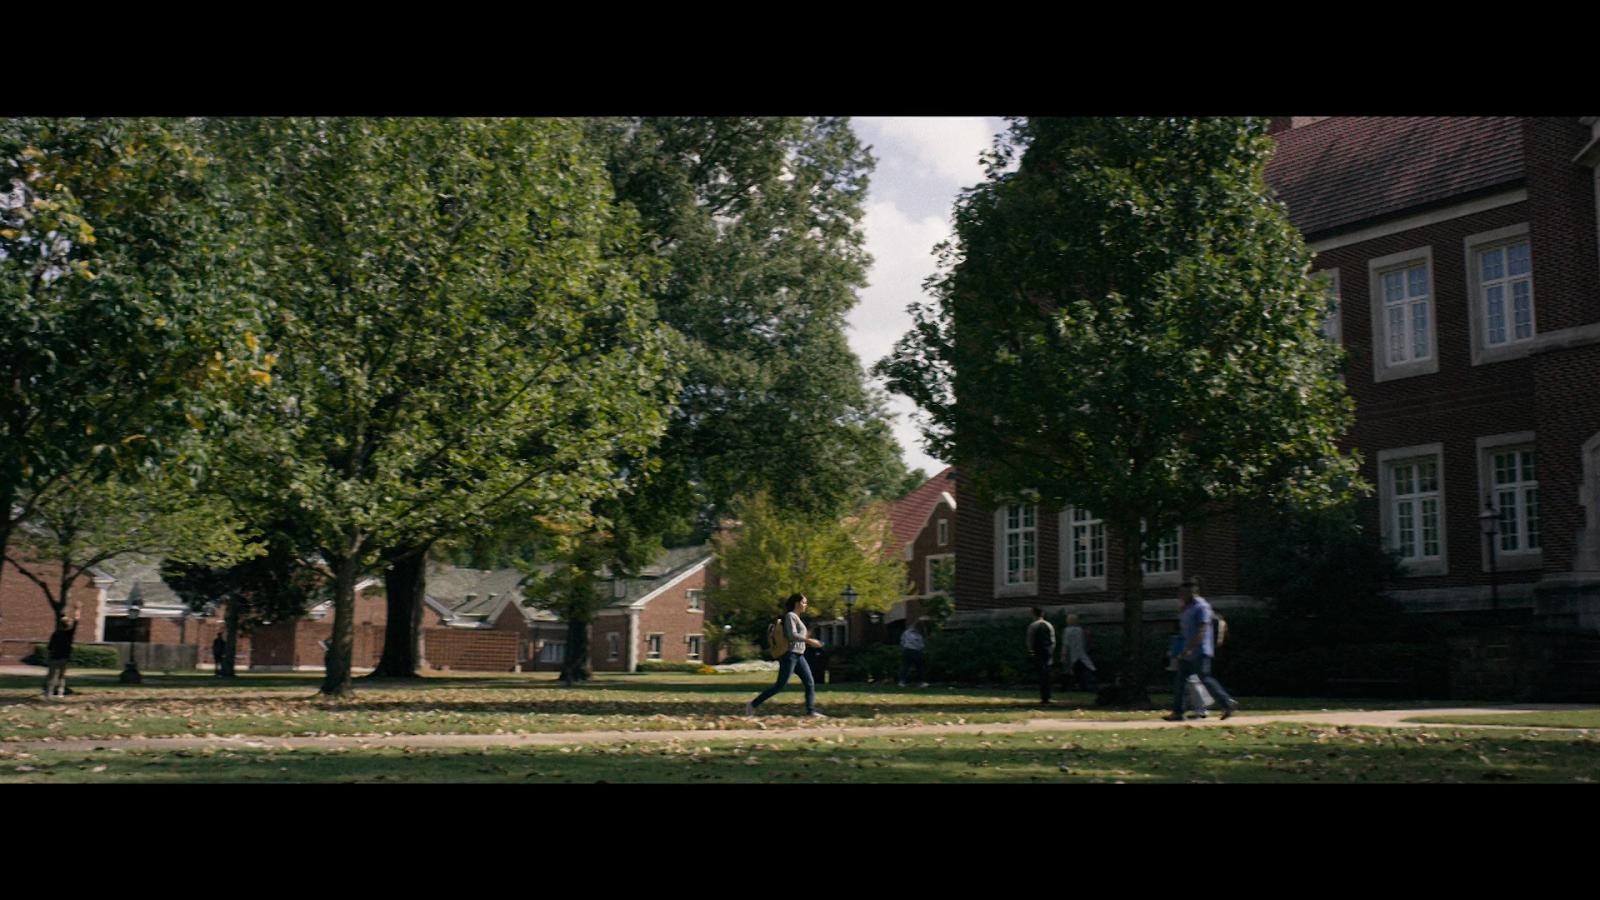 Dios no está muerto 3 (2018) BRRip Full HD 1080p Latino-Ingles captura 1